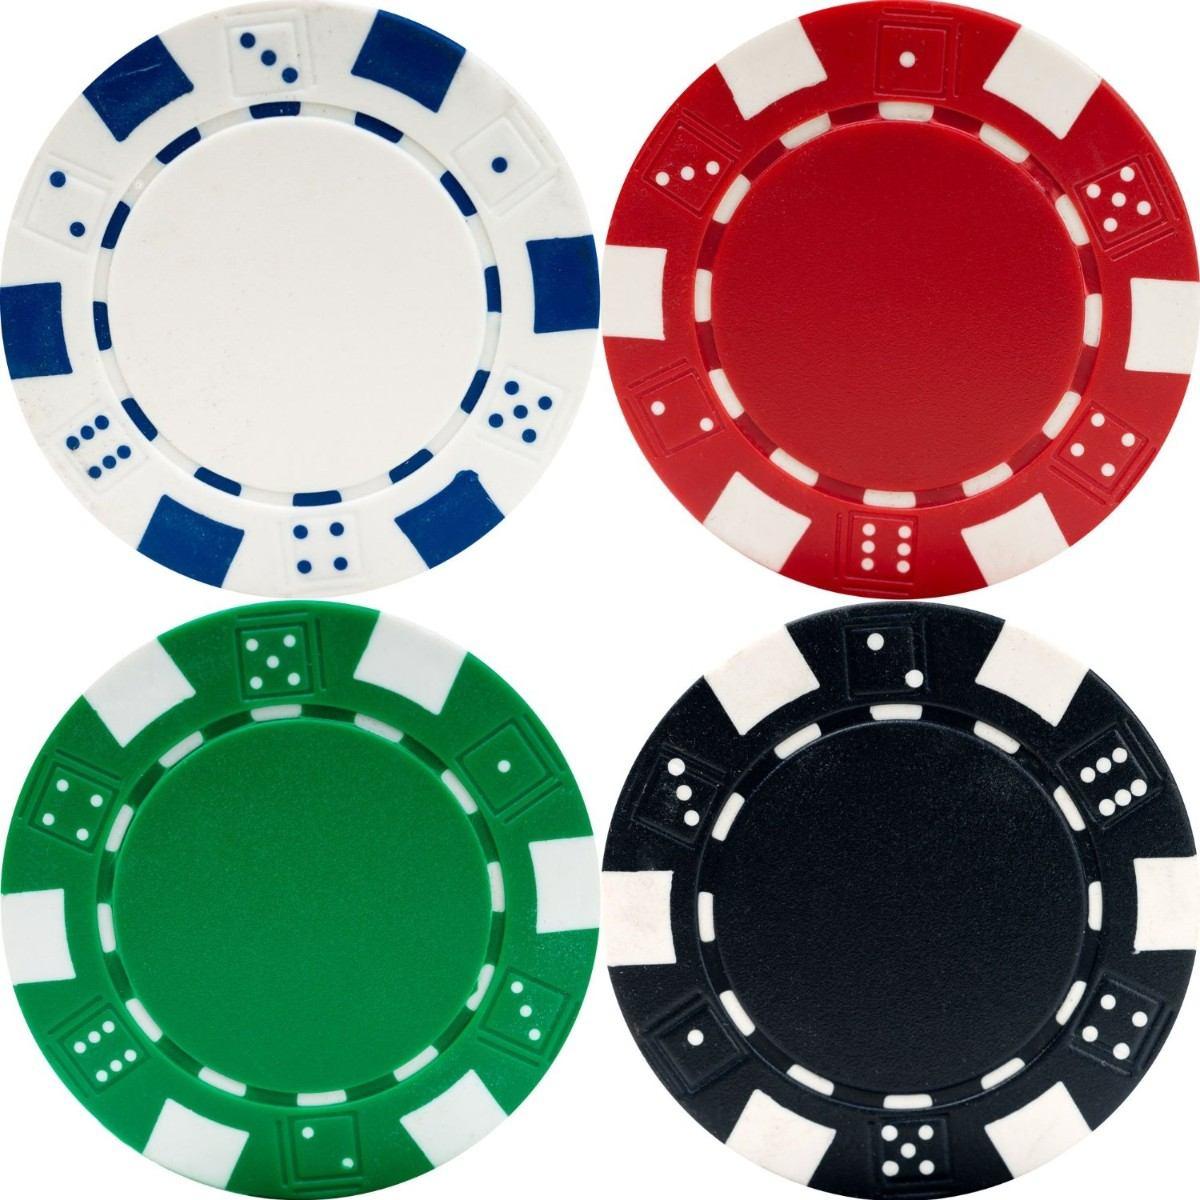 Juegos de mesa gratis poker